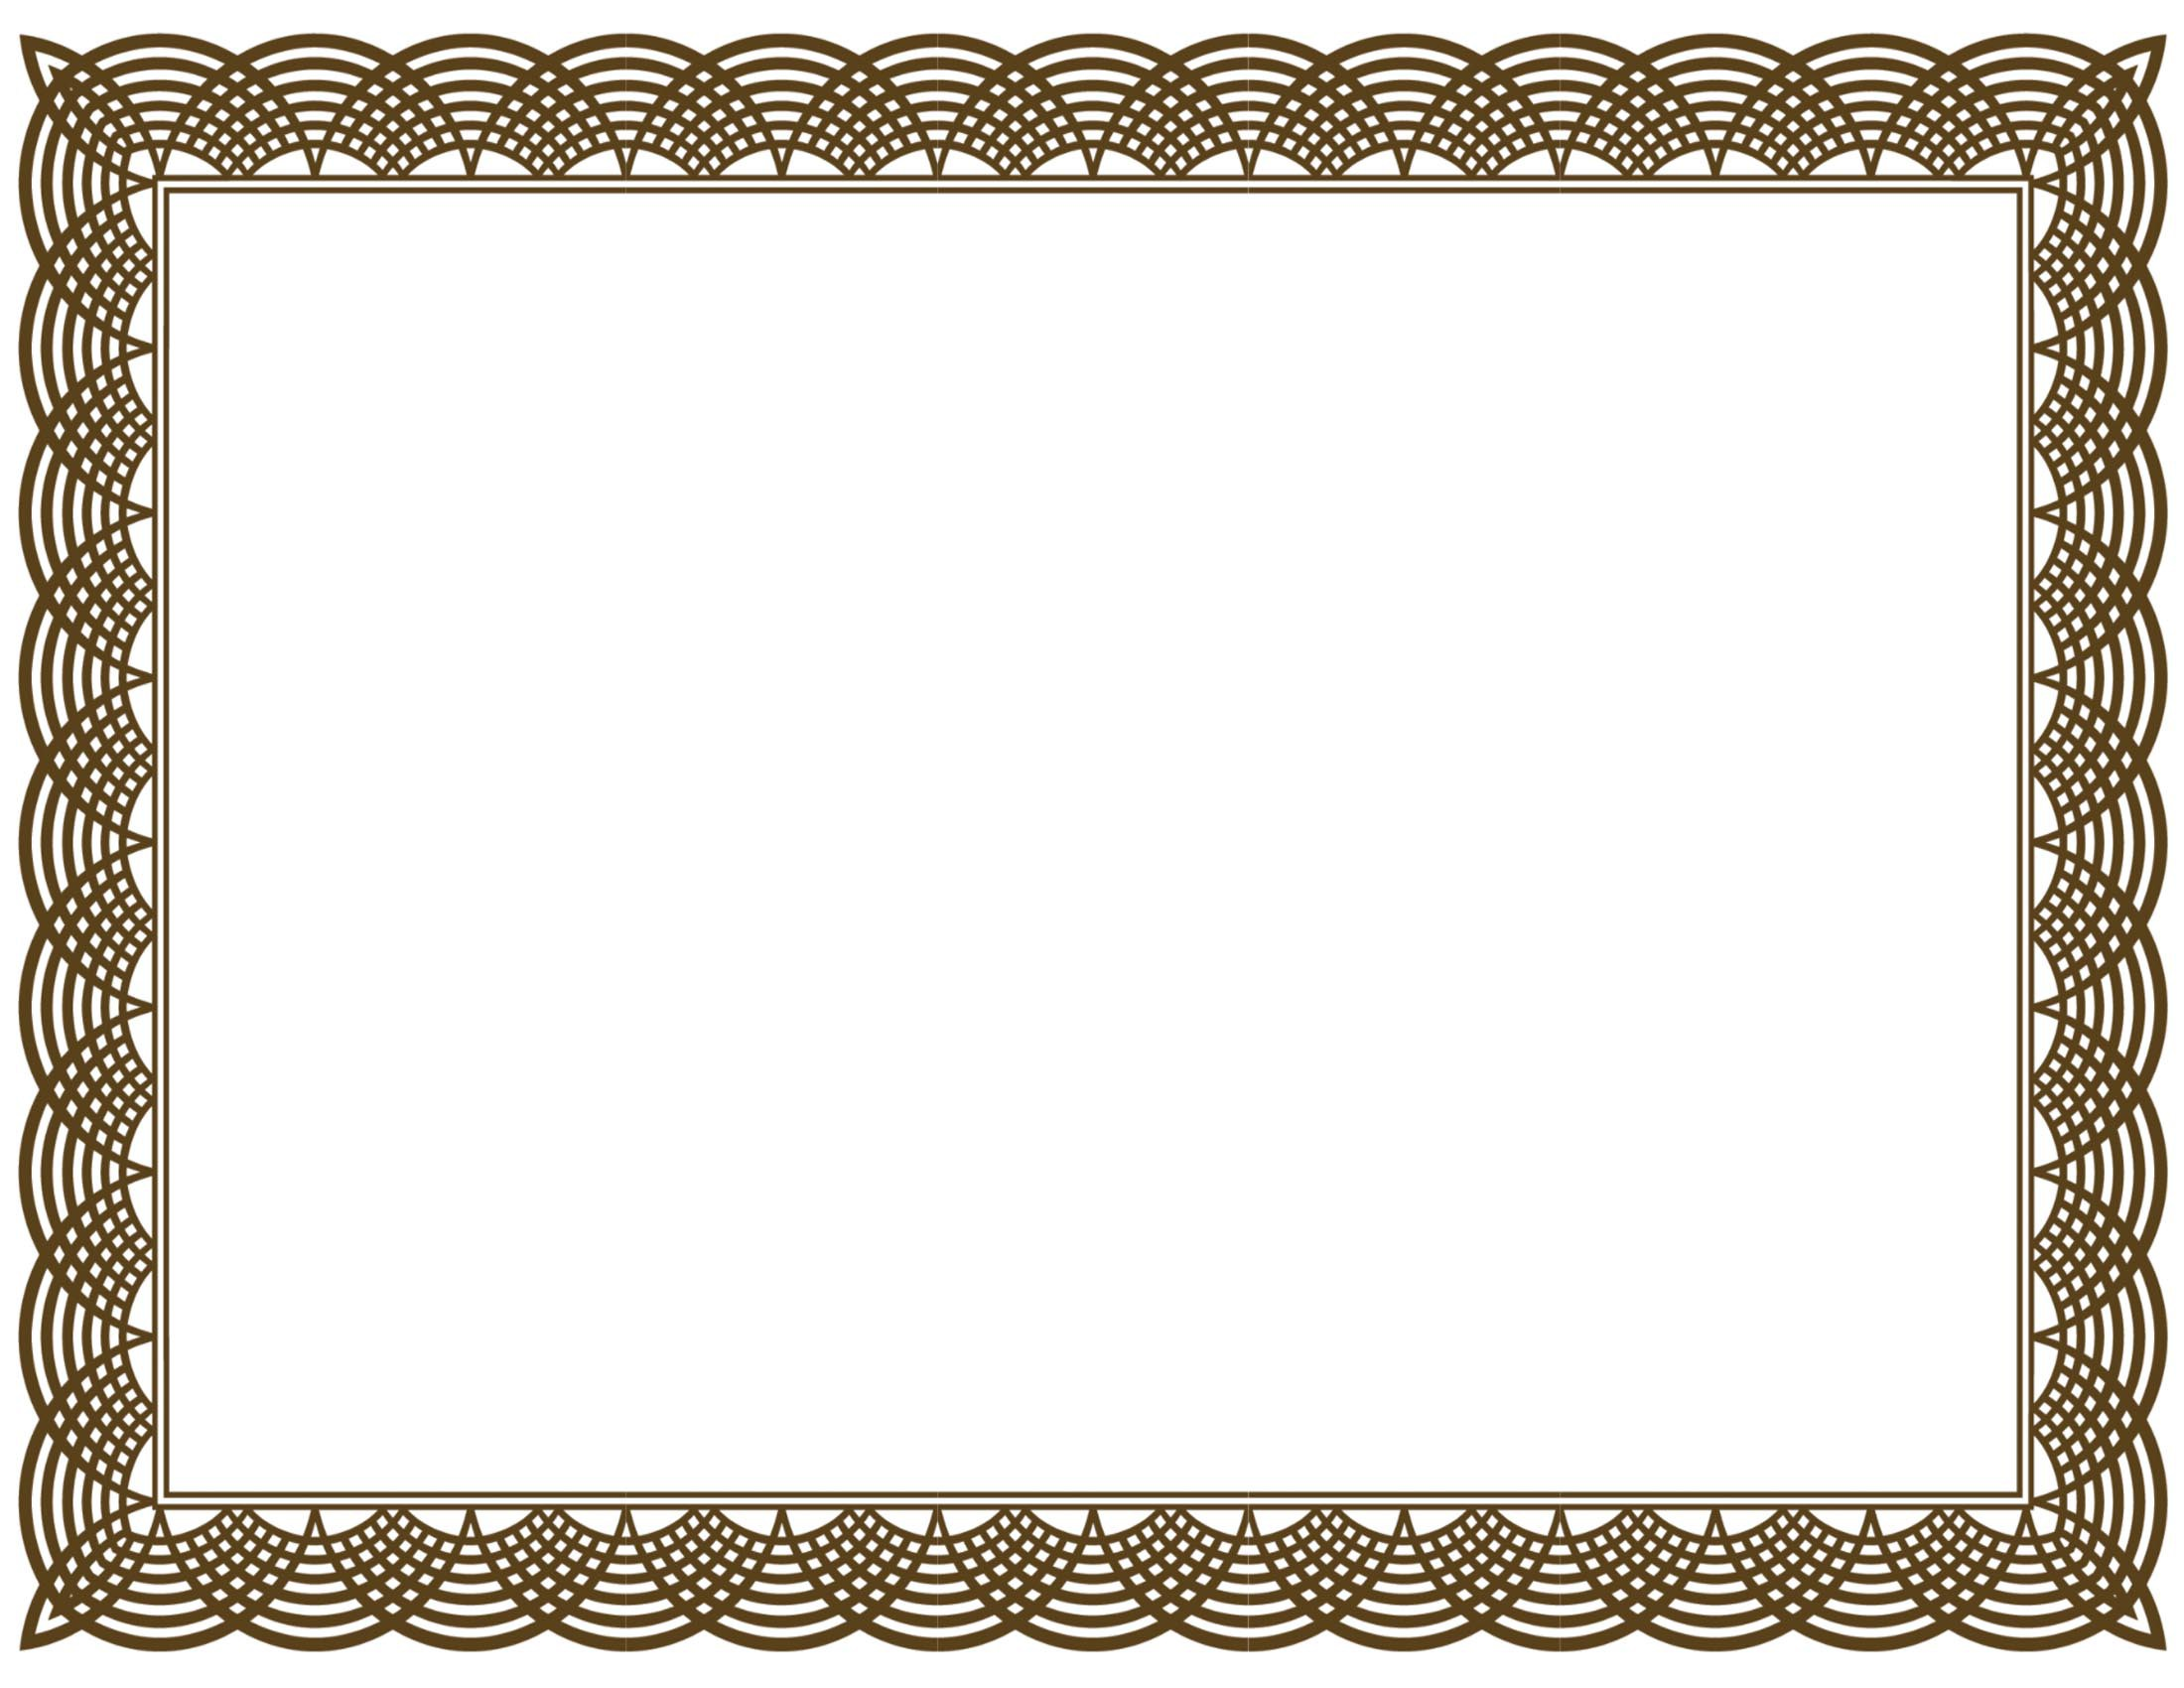 gift certificate border clipart clipart kid york yankees logo valentines day clip art borders certificate borders